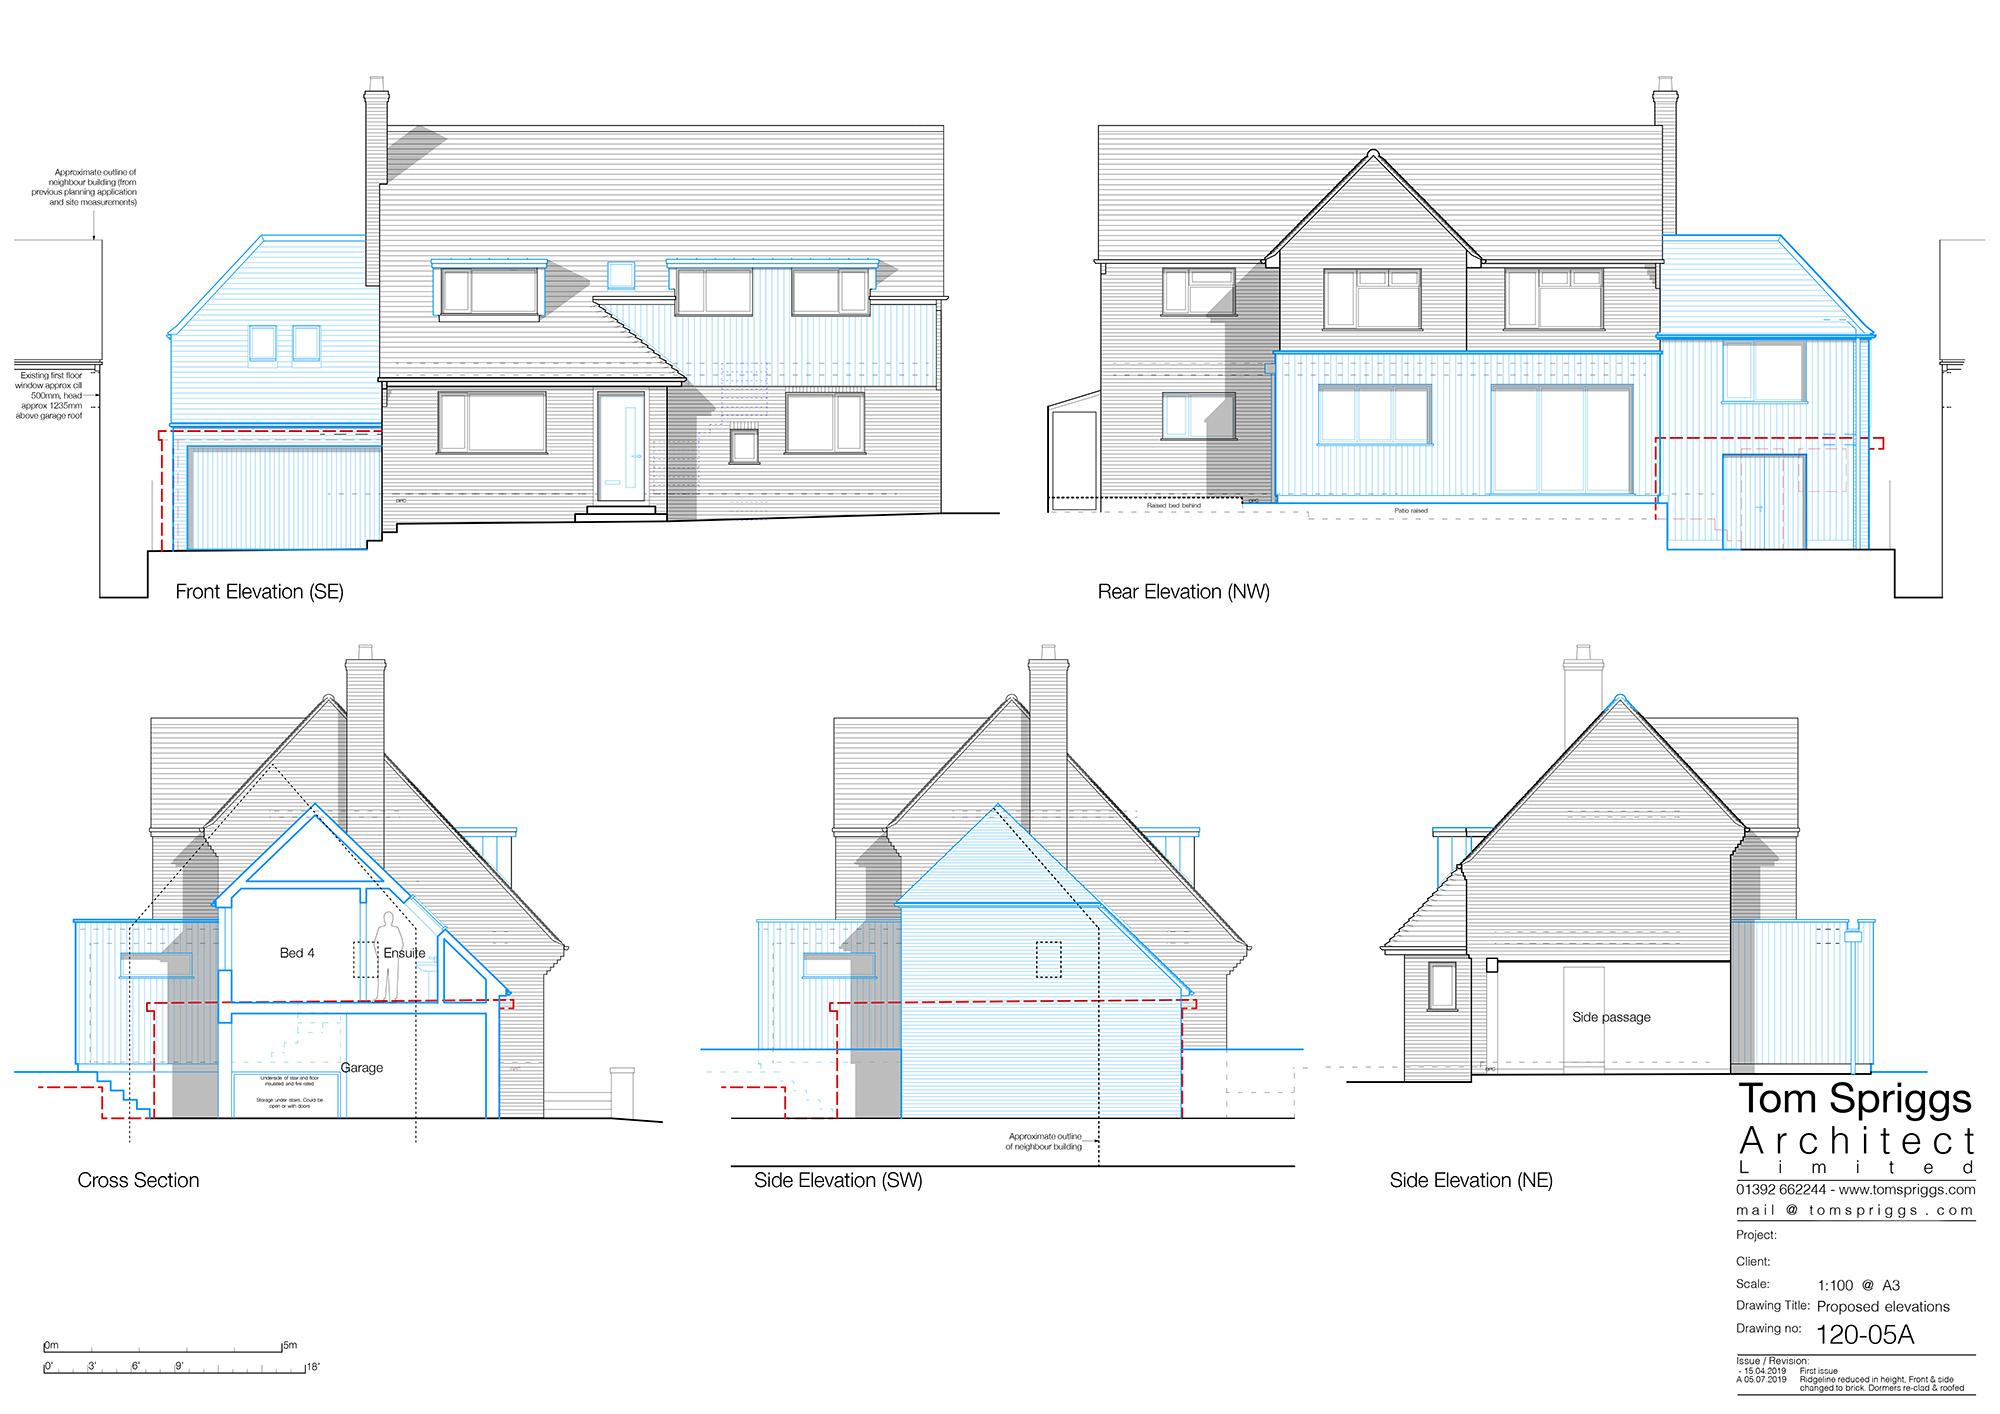 120-01 Planning drawings hybrid final copy.vwx